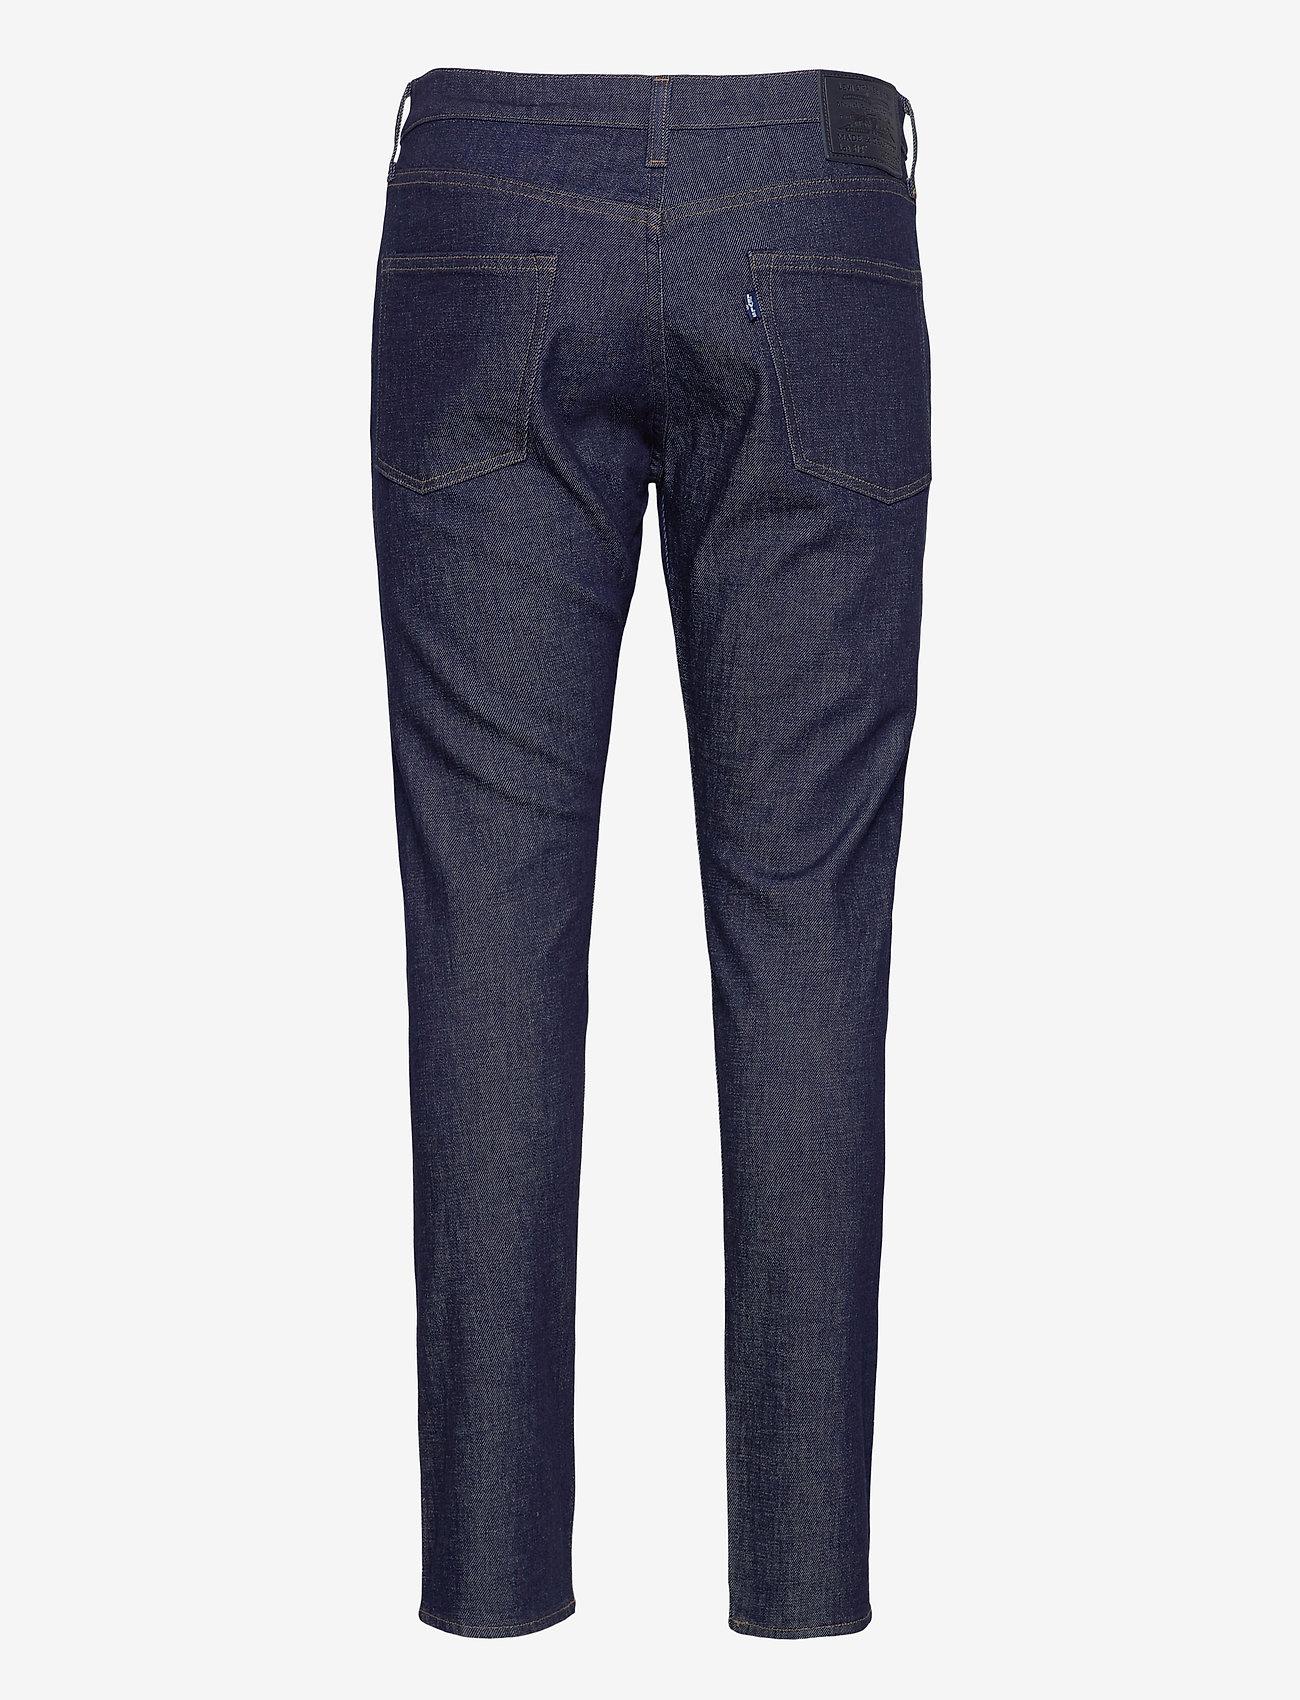 Levi's Made & Crafted - LMC 512 LMC INDIGO RESIN 1 - regular jeans - dark indigo - flat finish - 1